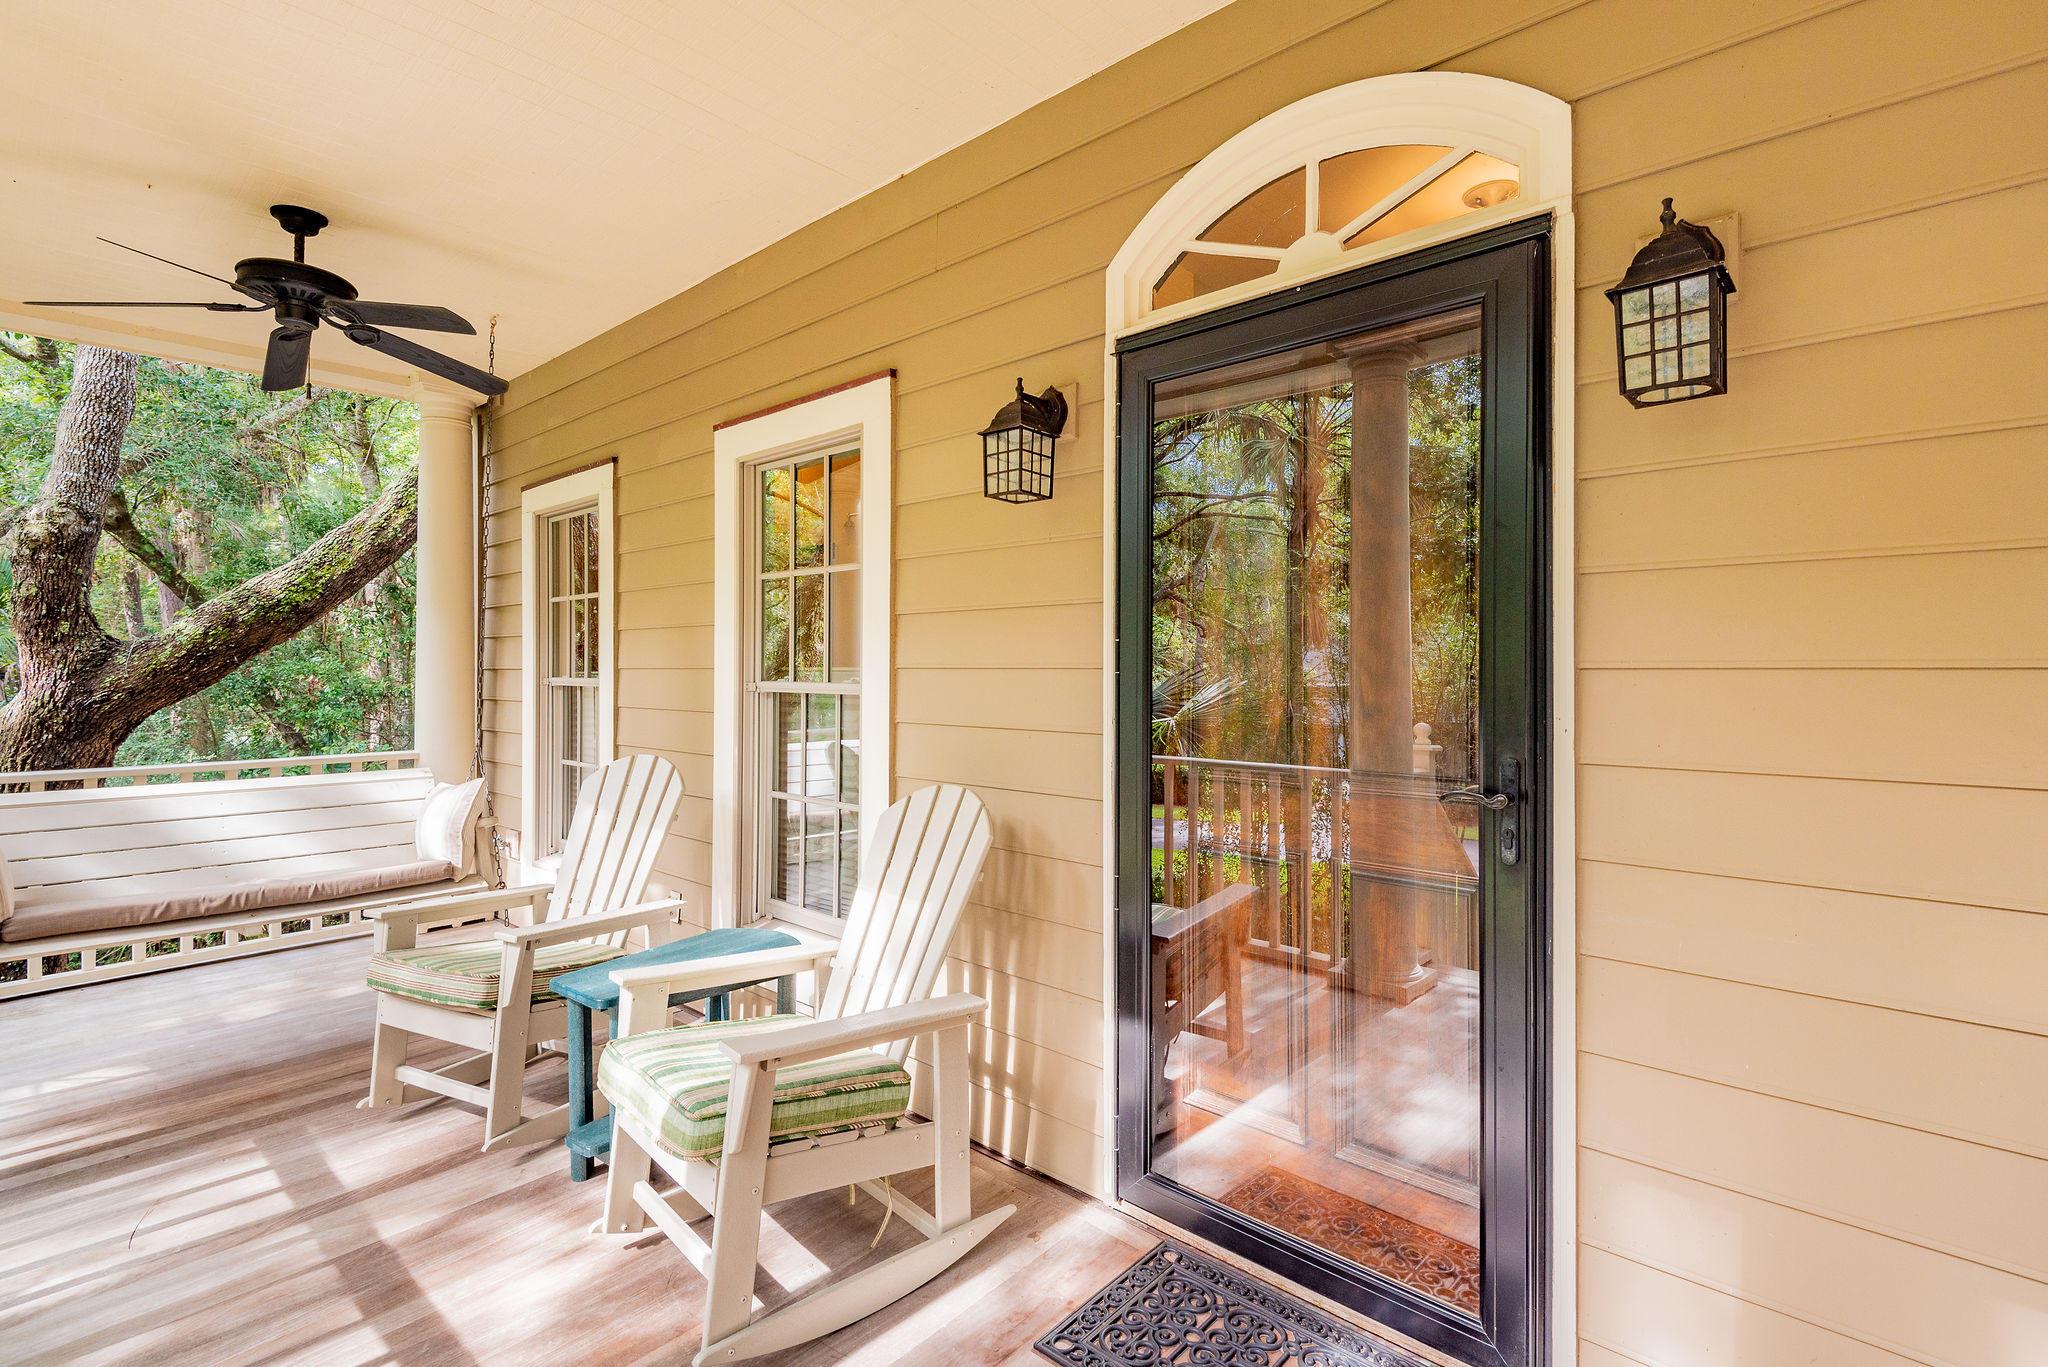 Kiawah Island Homes For Sale - 134 Conifer, Kiawah Island, SC - 10